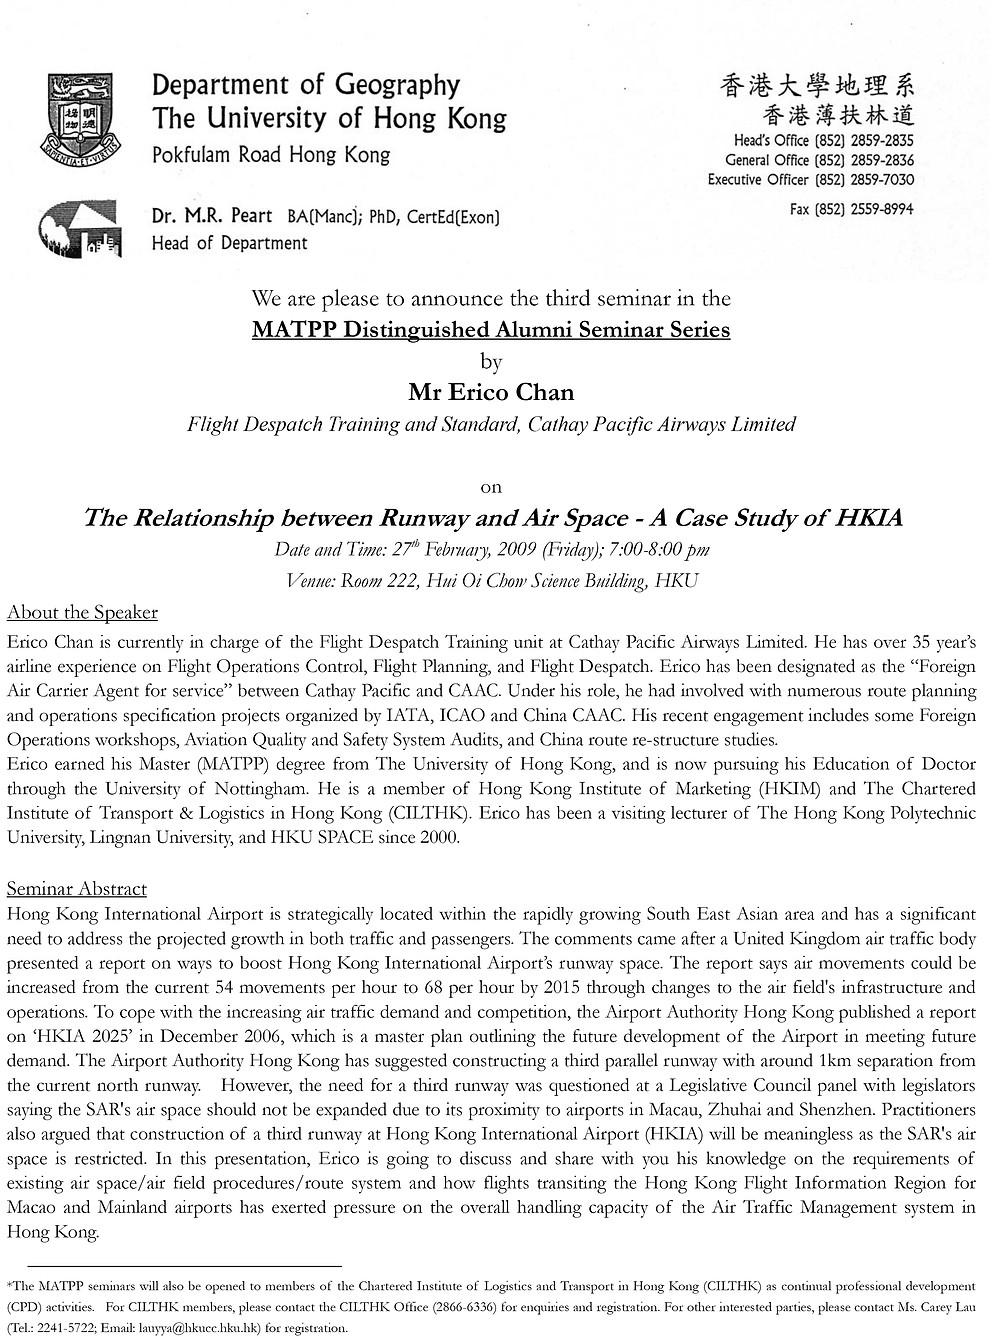 20090227 Seminar Poster